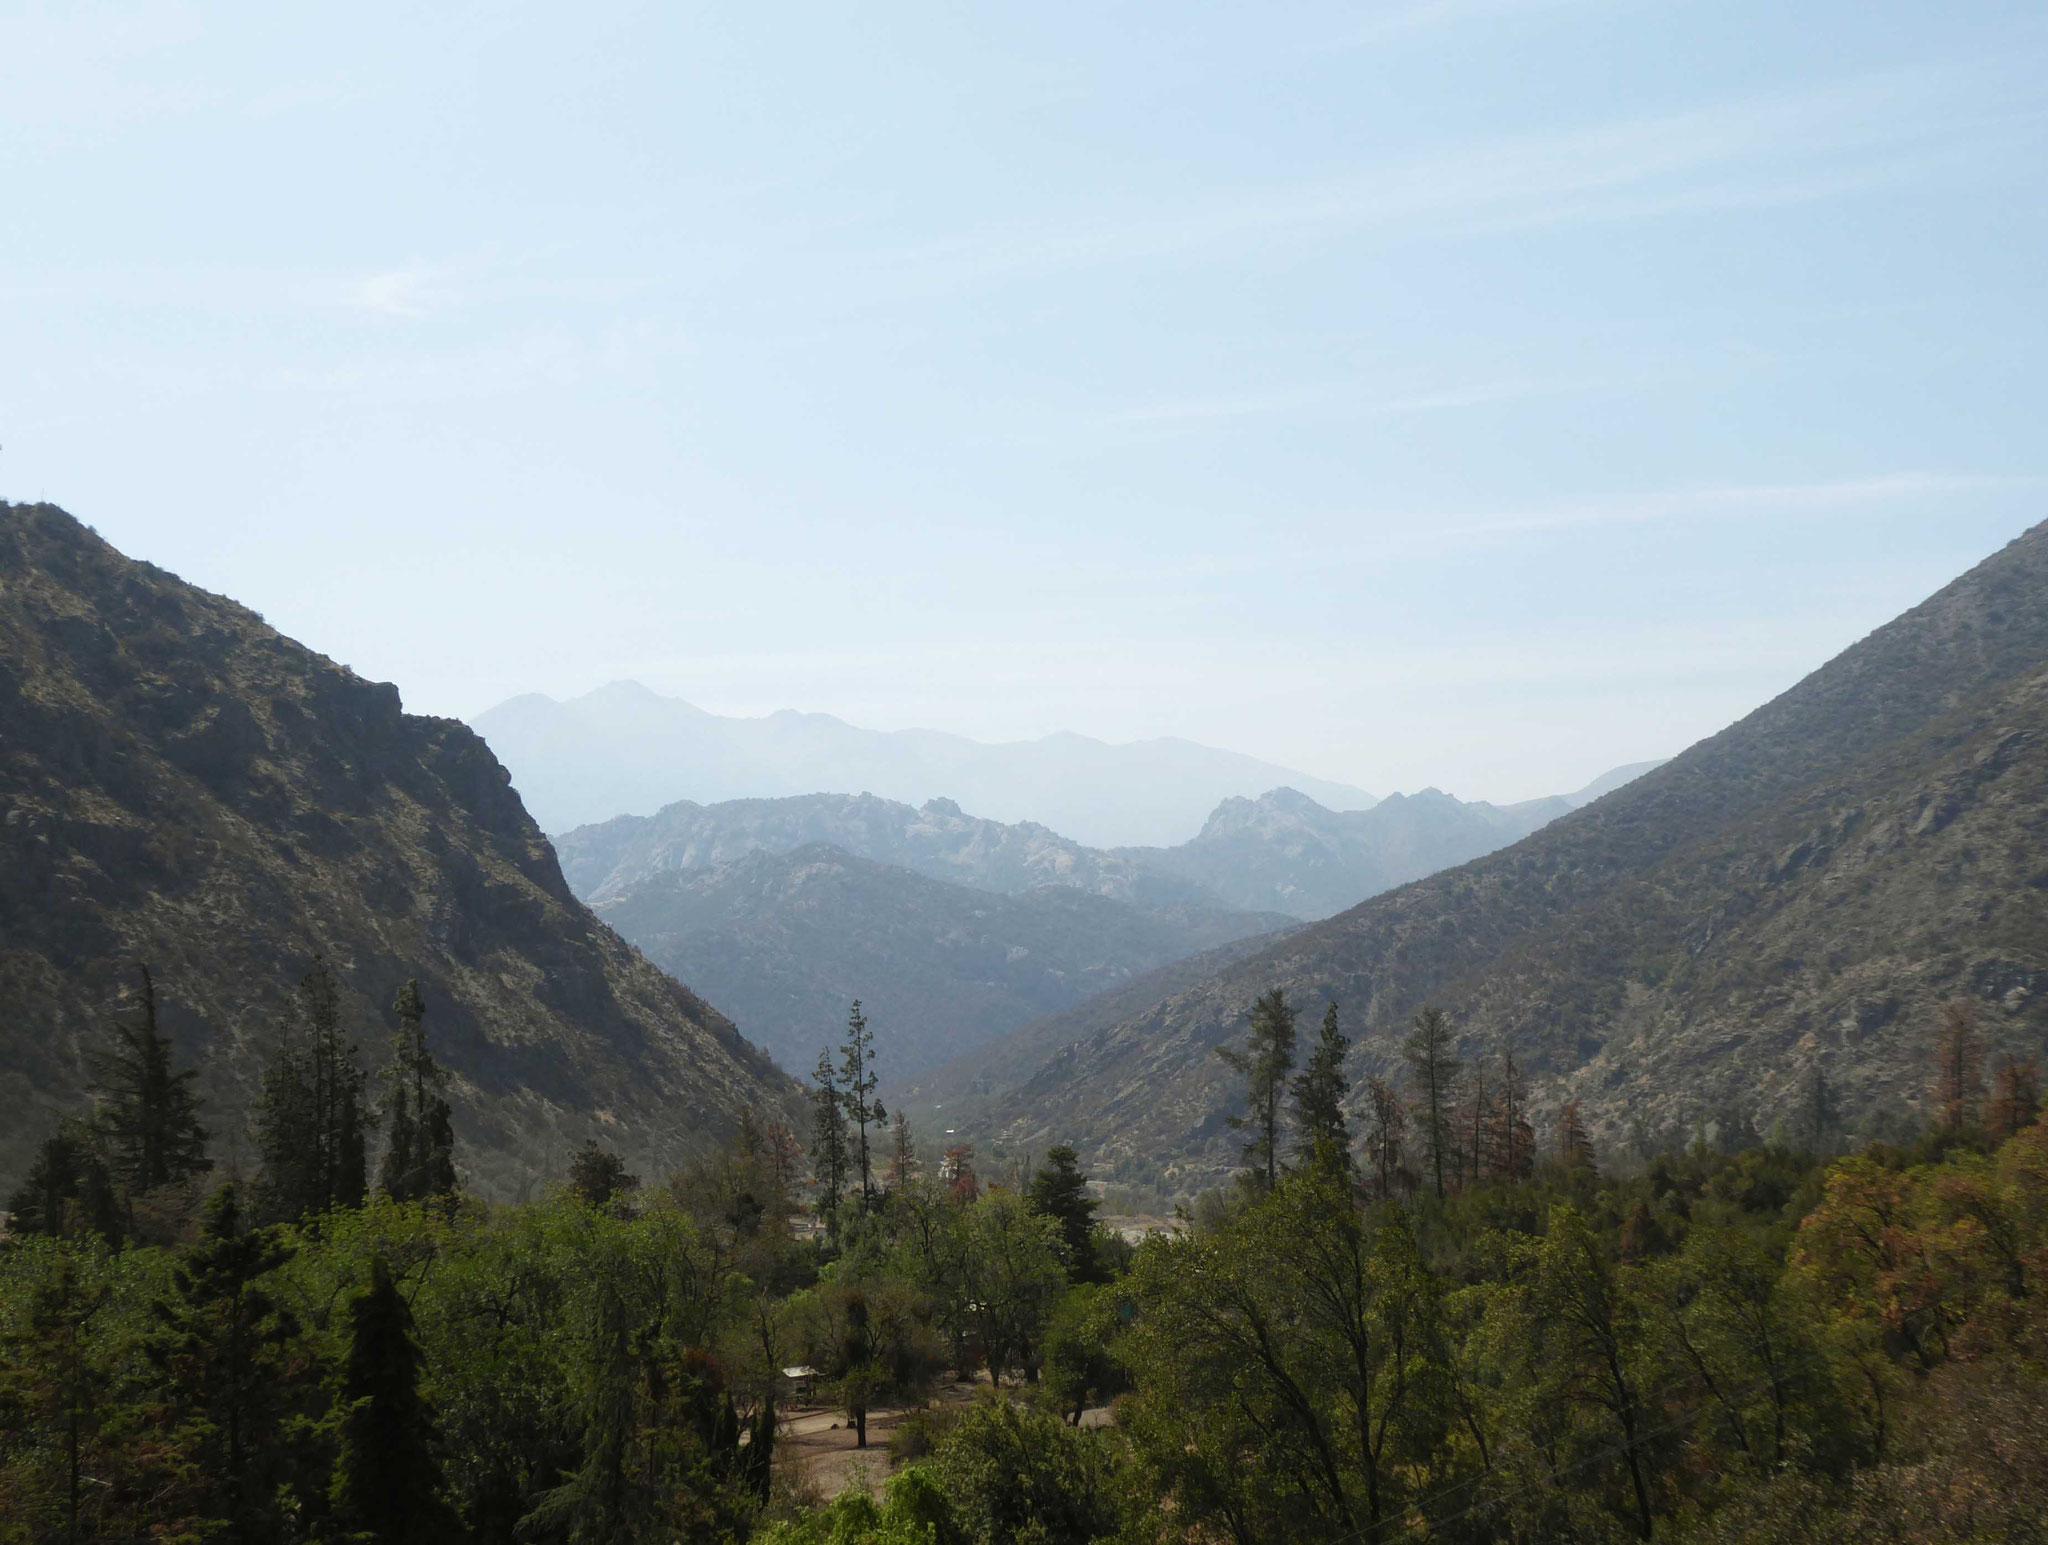 Vallée encaissée du Cajón del Maipo